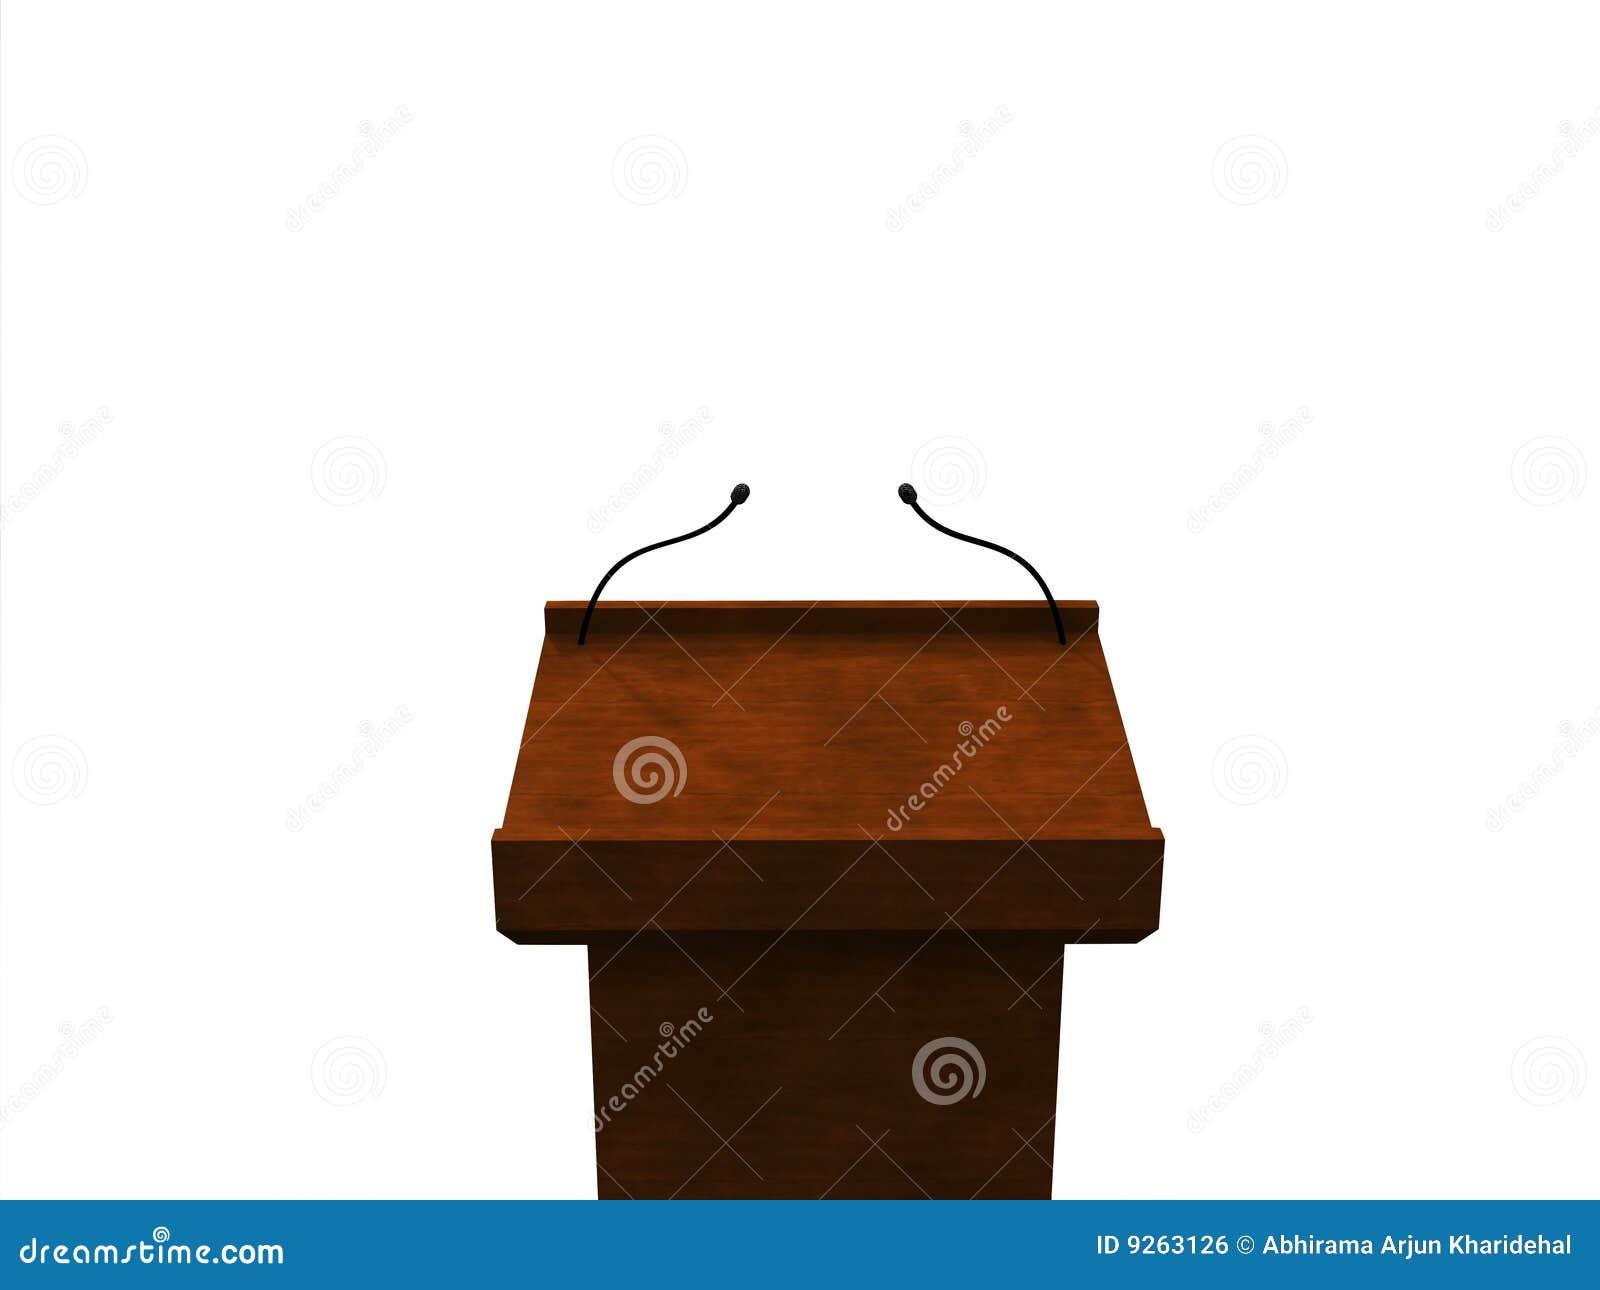 Podium Plans Woodworking Wooden Podium Plans